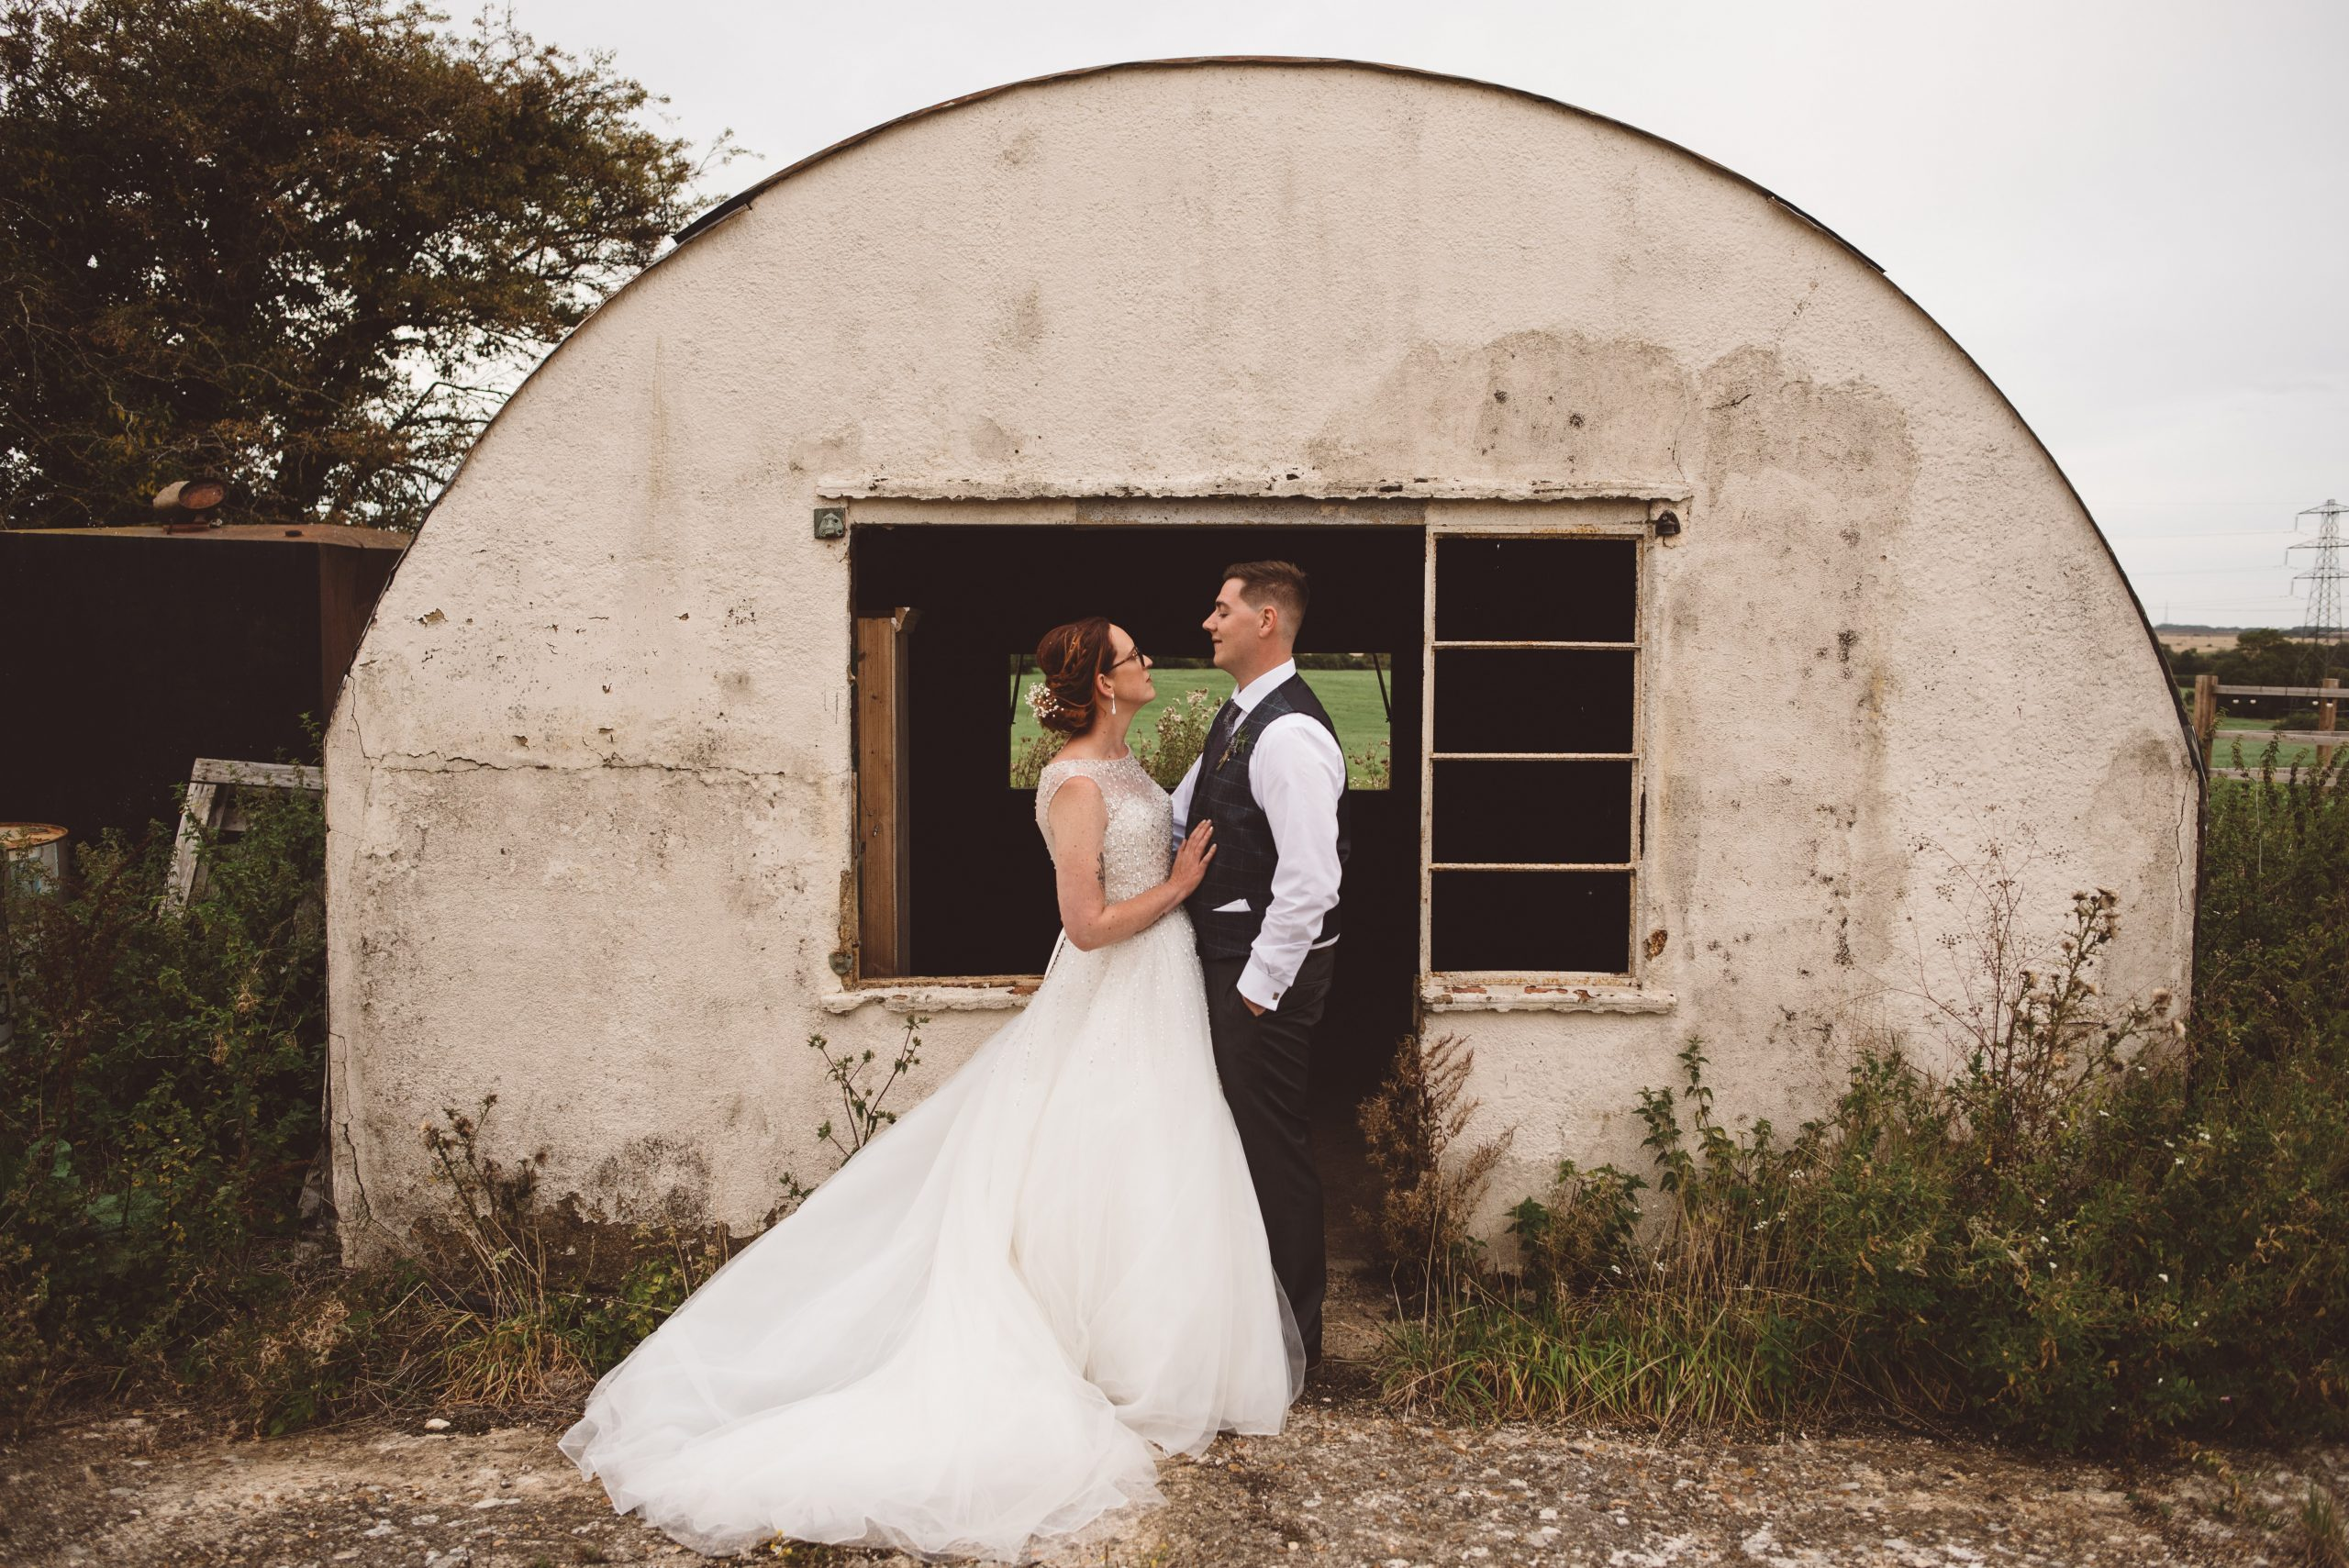 Milling Barn wedding photography rustic venue